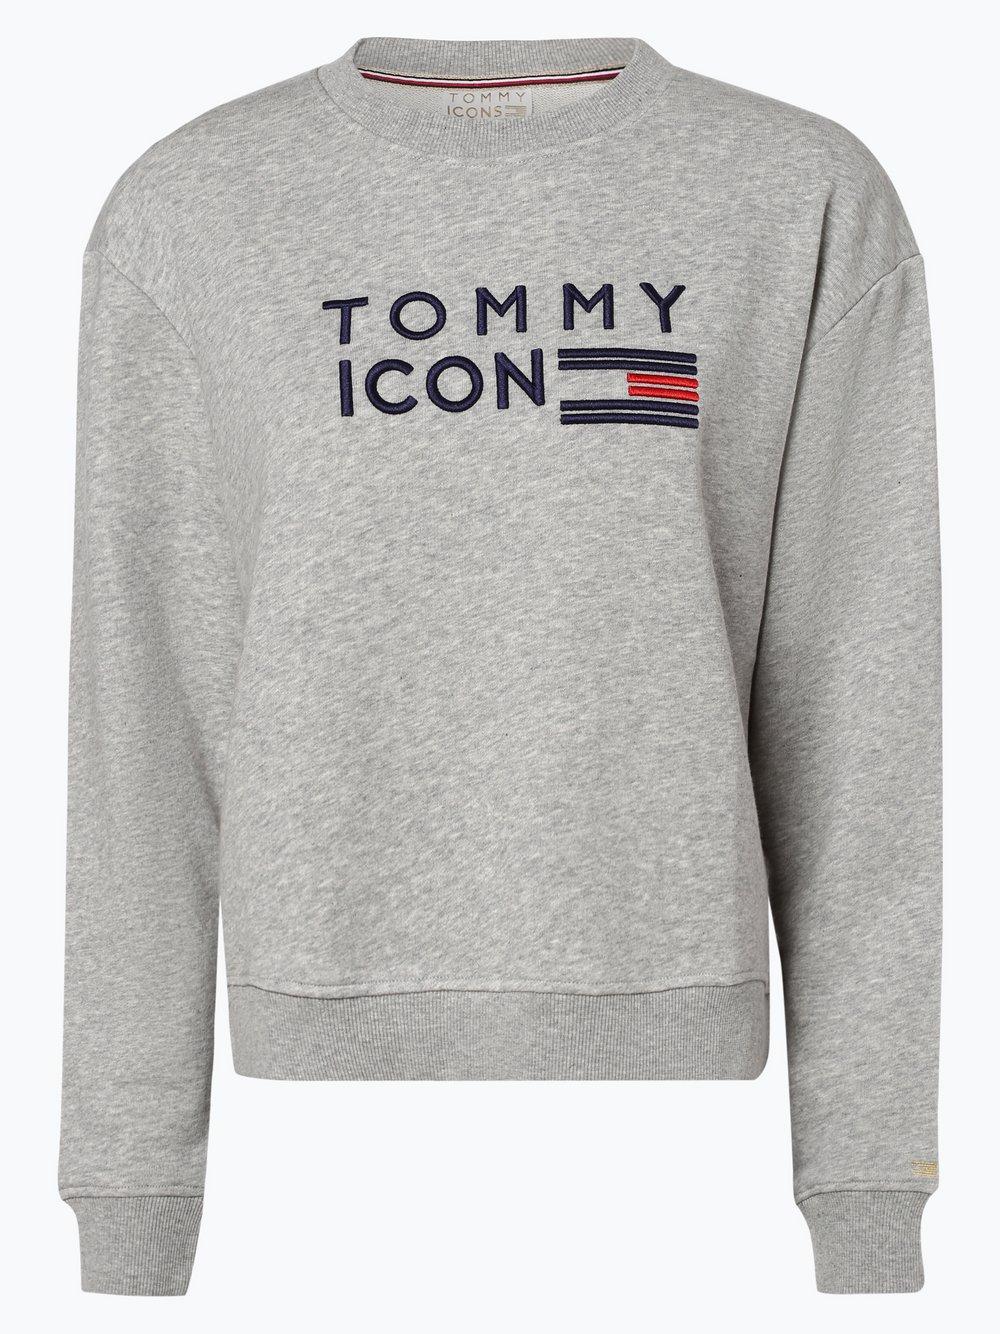 9985c4d87d11f7 Tommy Hilfiger Damen Sweatshirt - Tommy Icons Sweatshirt online ...